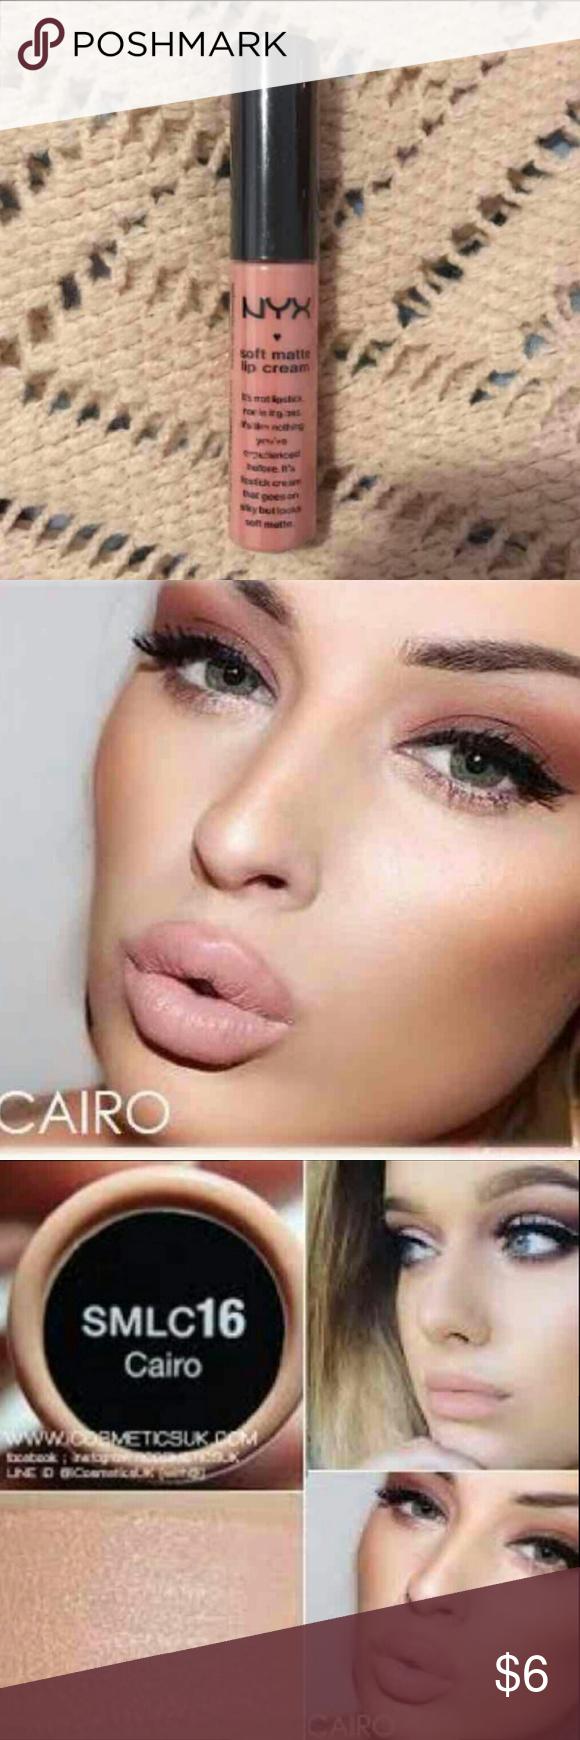 Nyx Cairobrand New Makeup Lipstick Make Inez Contour Plus Riviera Blush